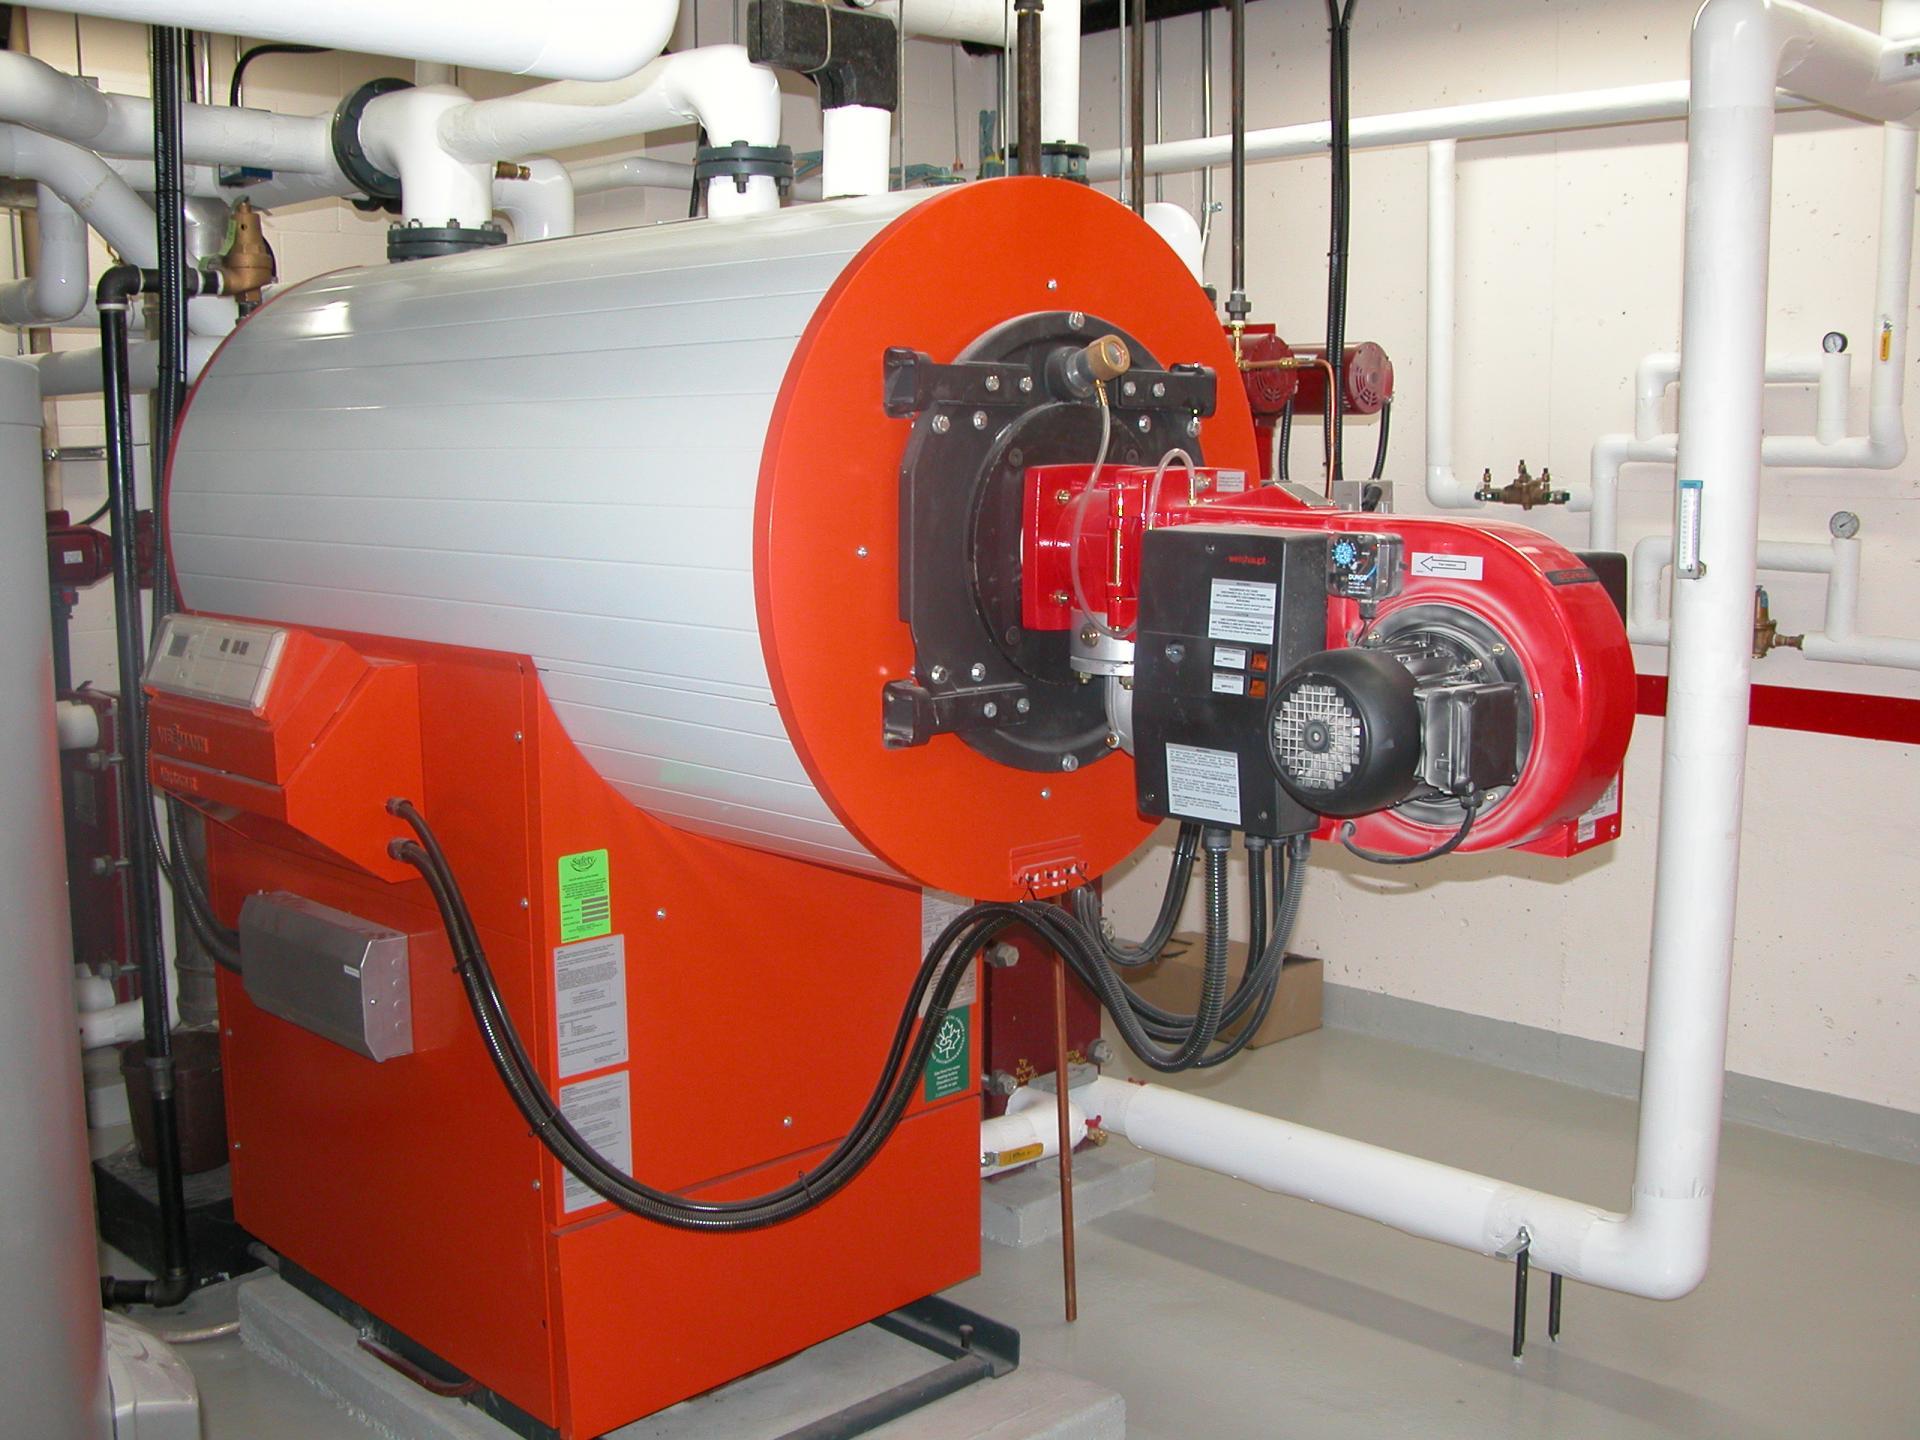 Viessmann vertomat condenation boiler